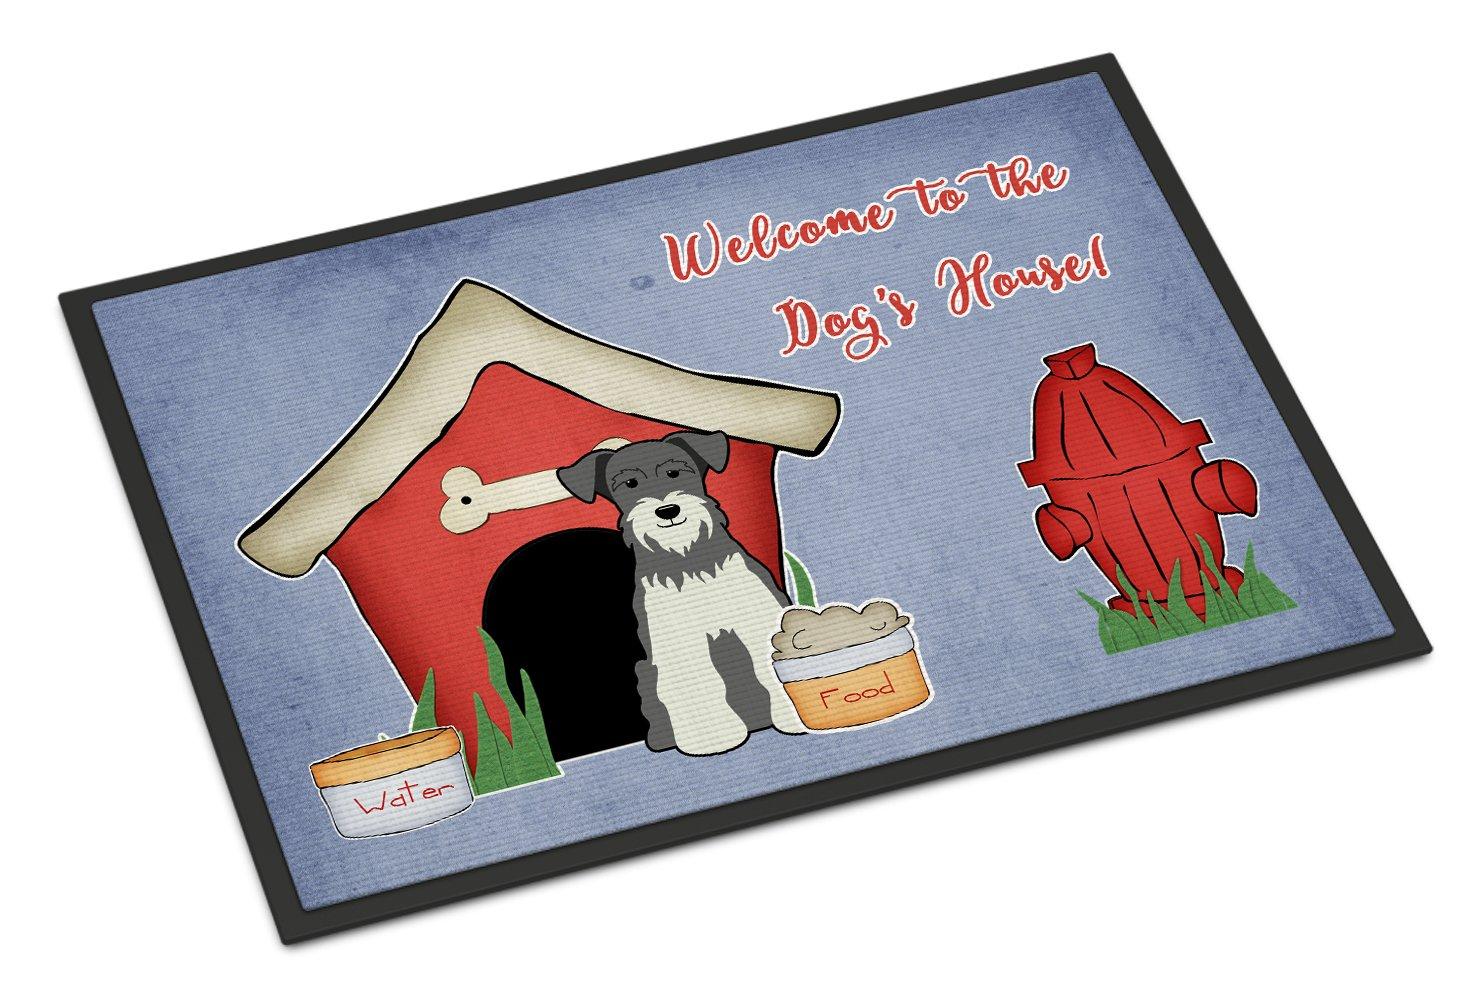 Carolines Treasures Dog House Collection Miniature Schanuzer Salt and Pepper Indoor or Outdoor Mat 18x27 BB2808MAT 18 x 27 Multicolor